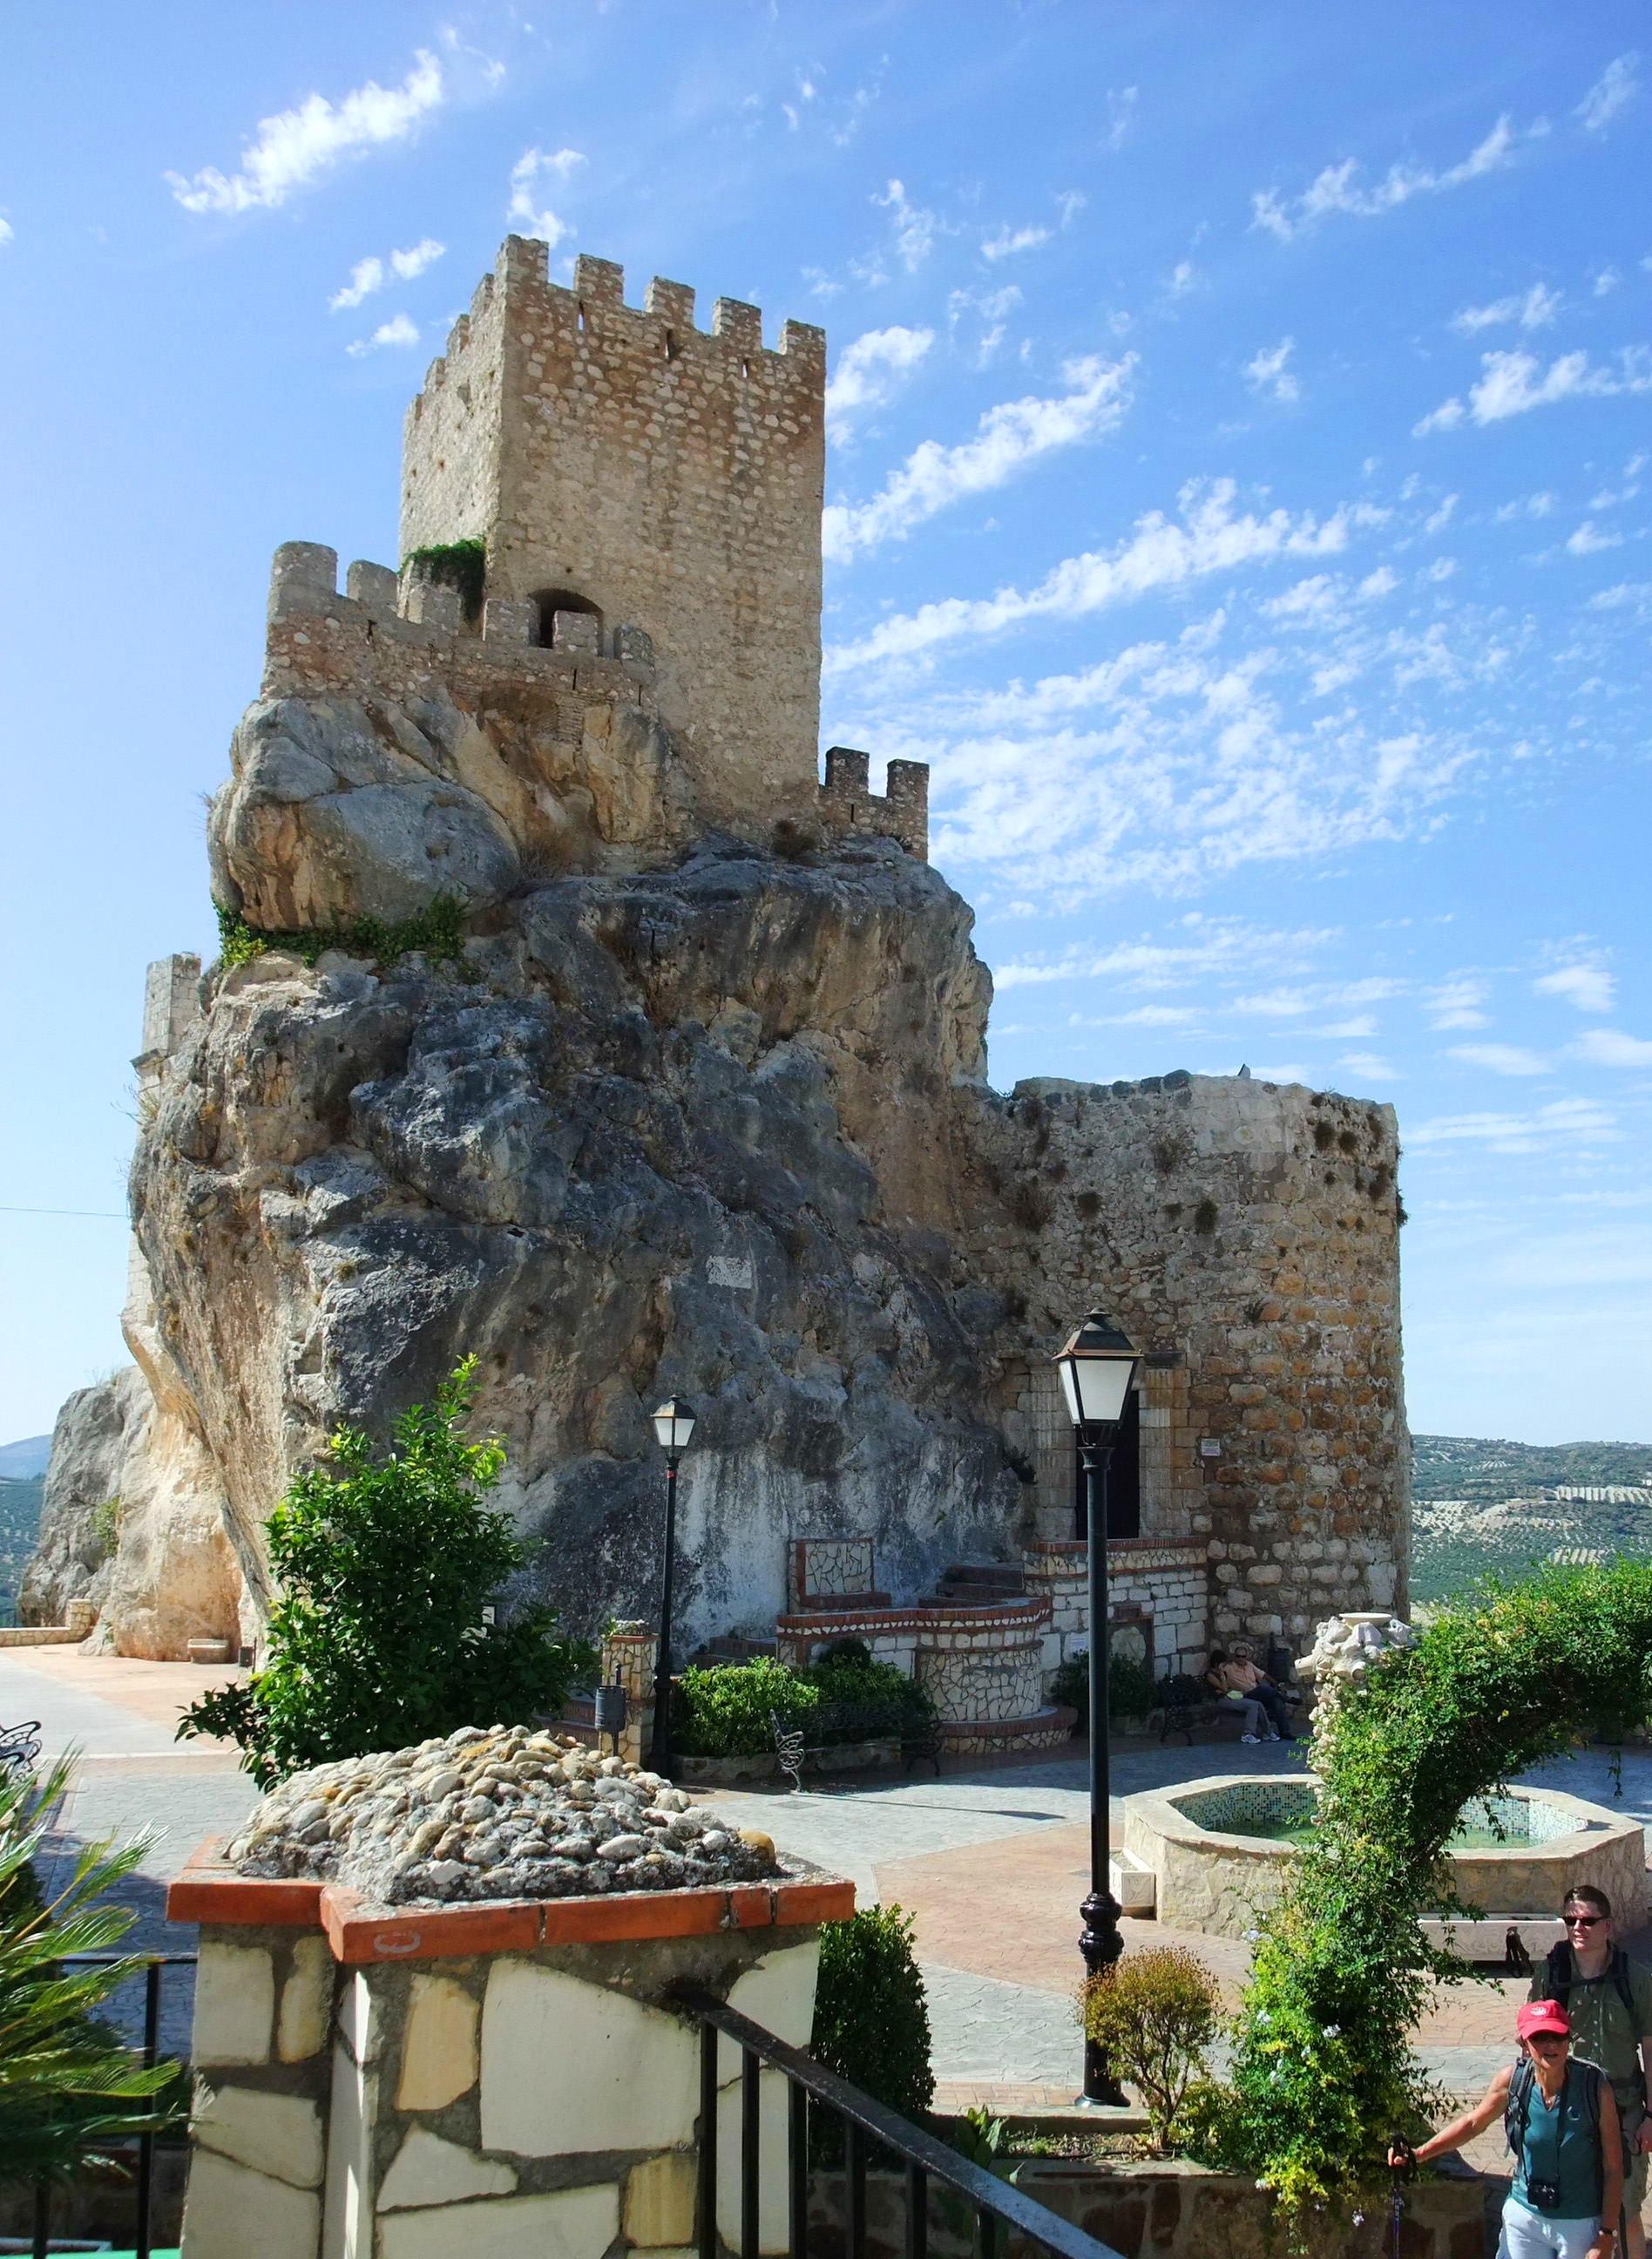 Zuheros castle, Spain